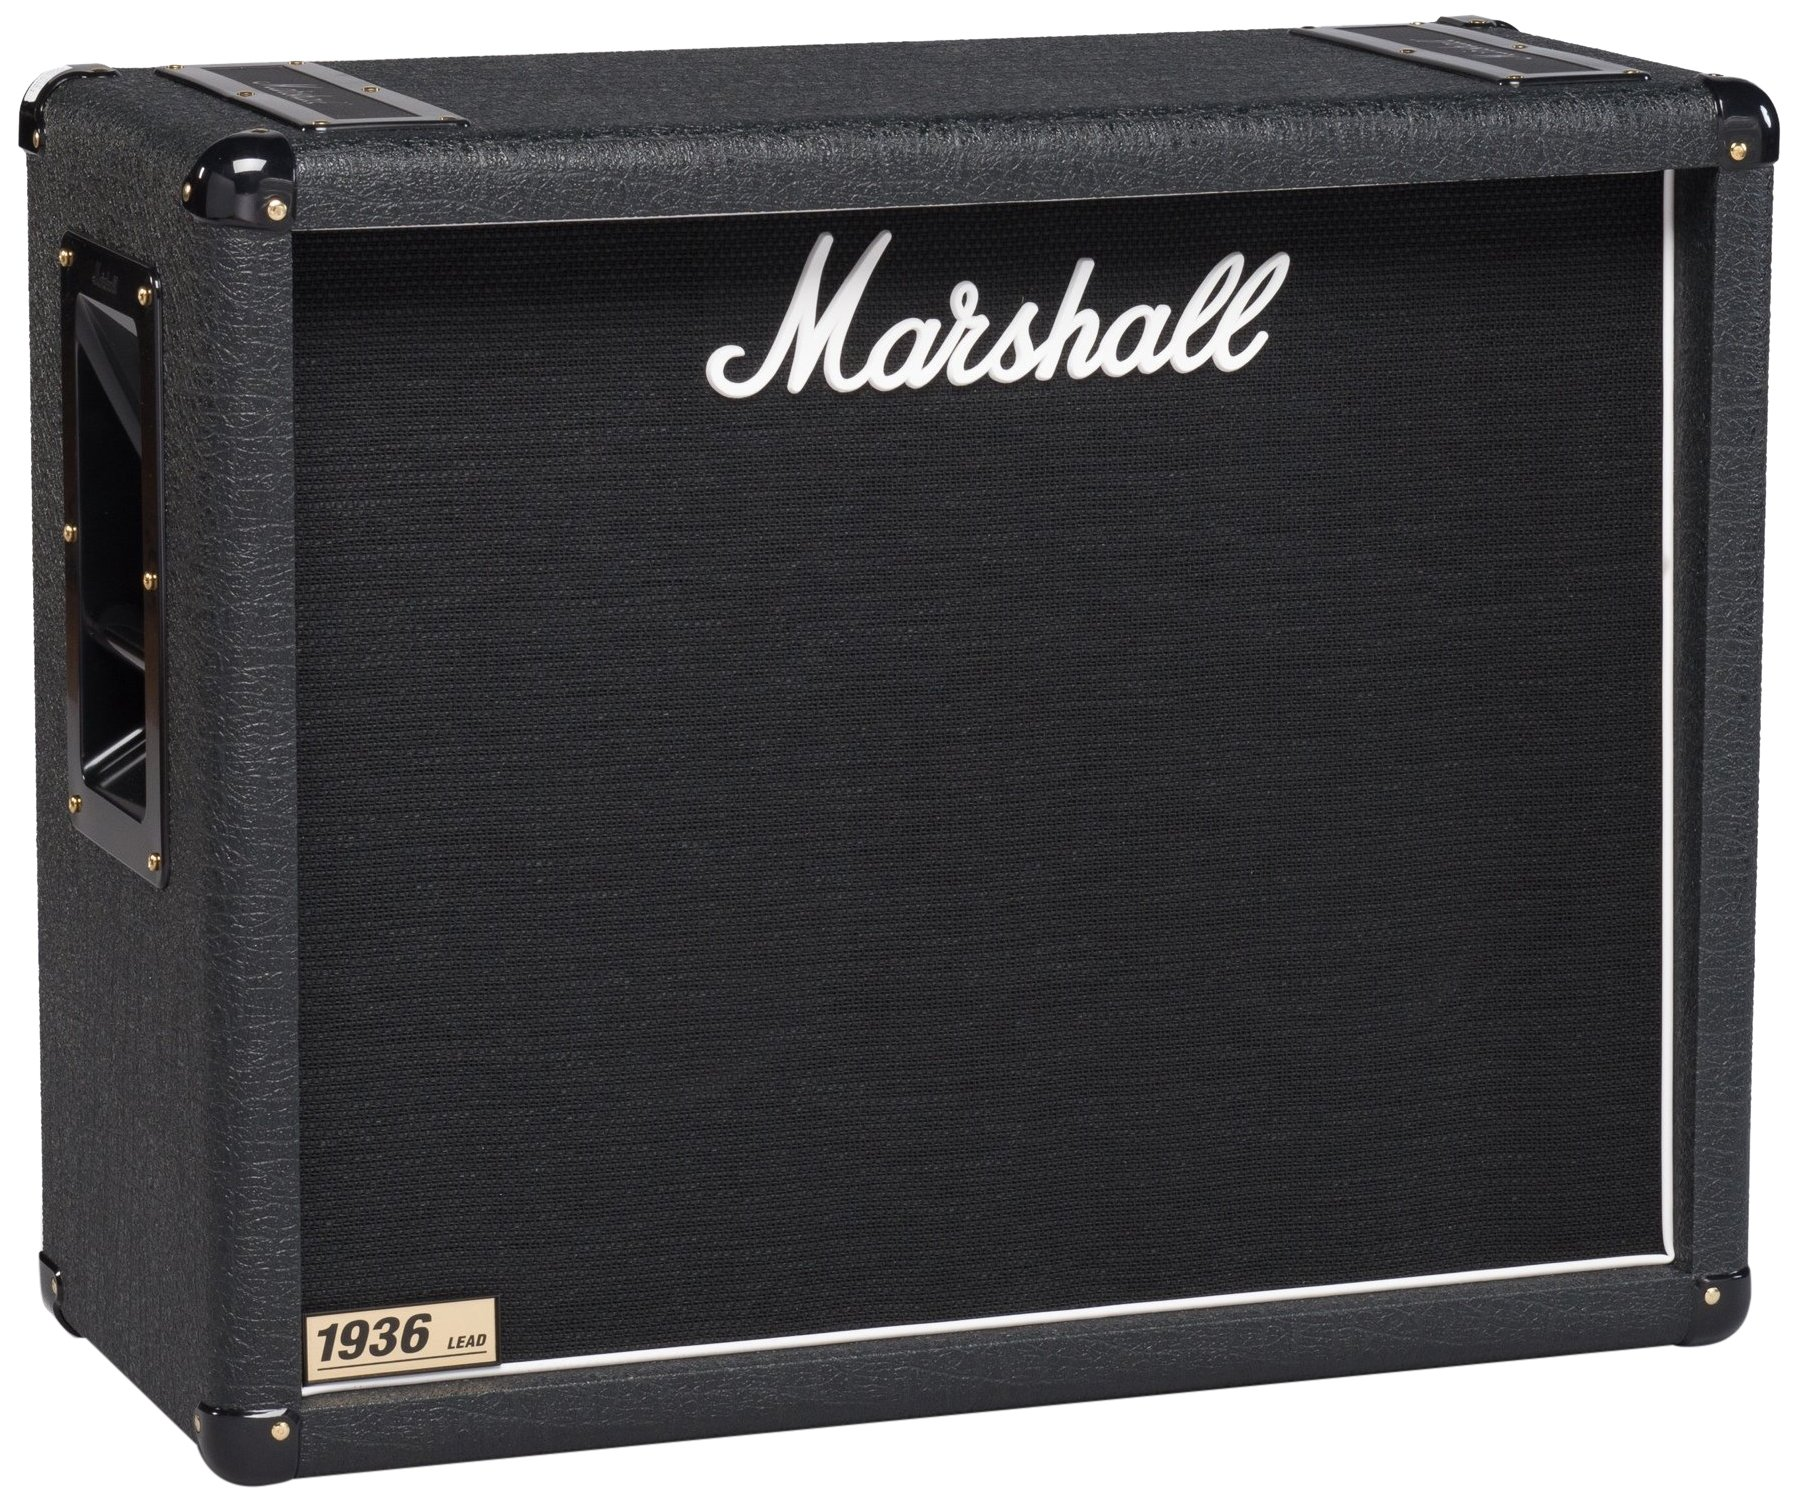 Marshall 1936 M-1936-U Guitar Amplifier Cabinet